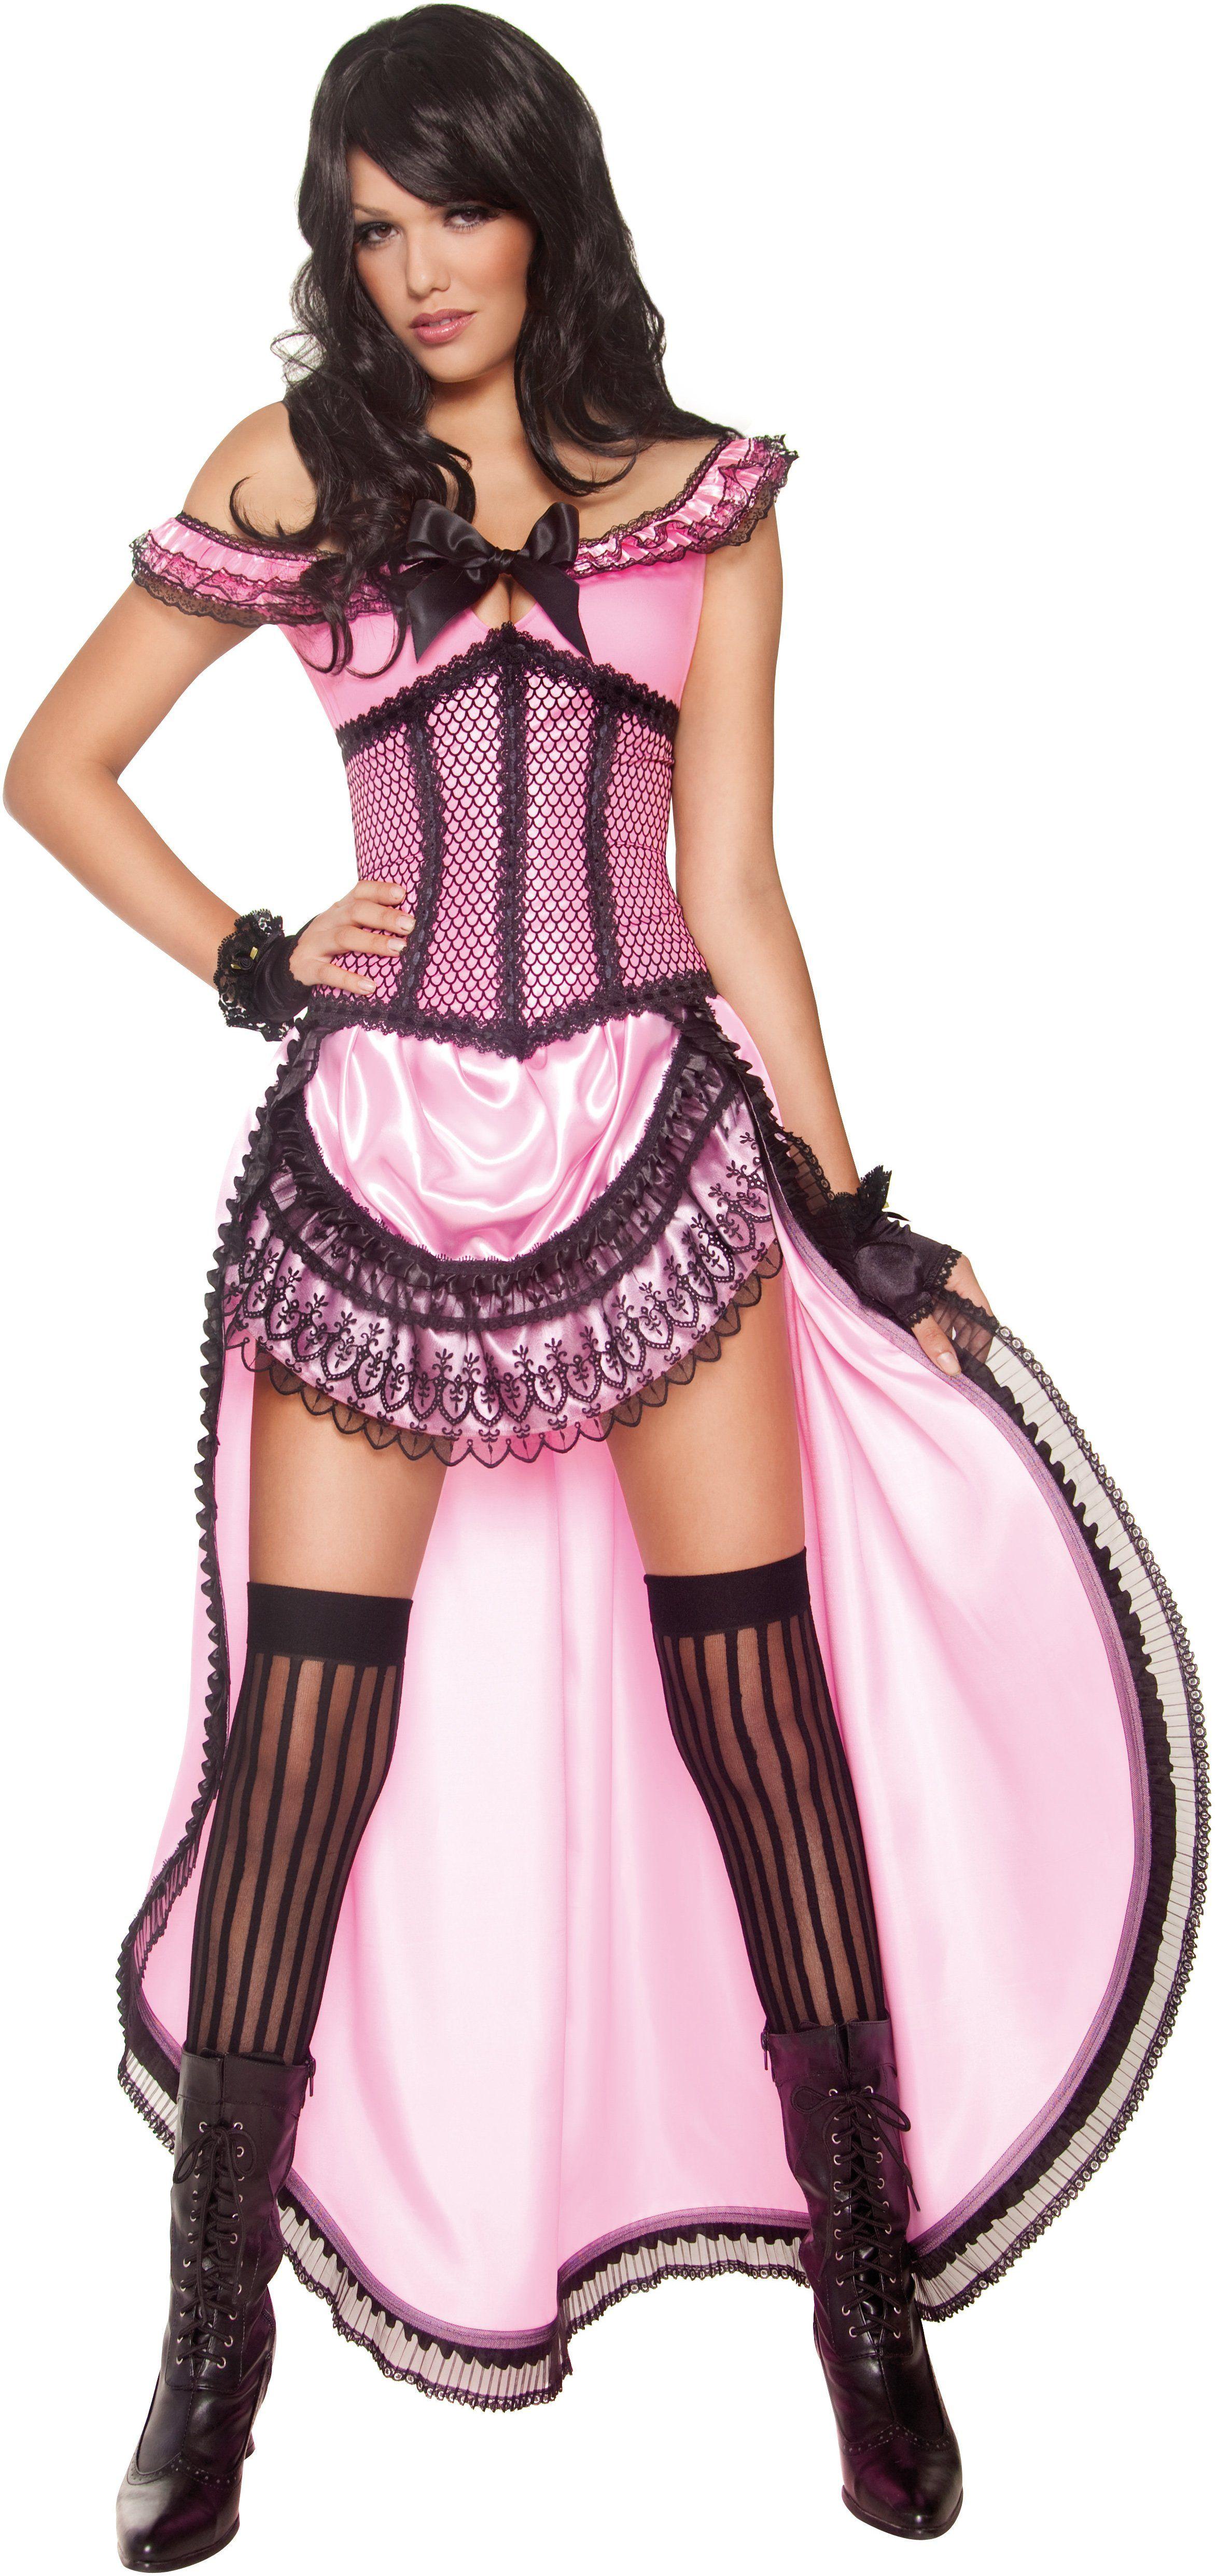 fee4860ebb7 Brothel Babe Costume